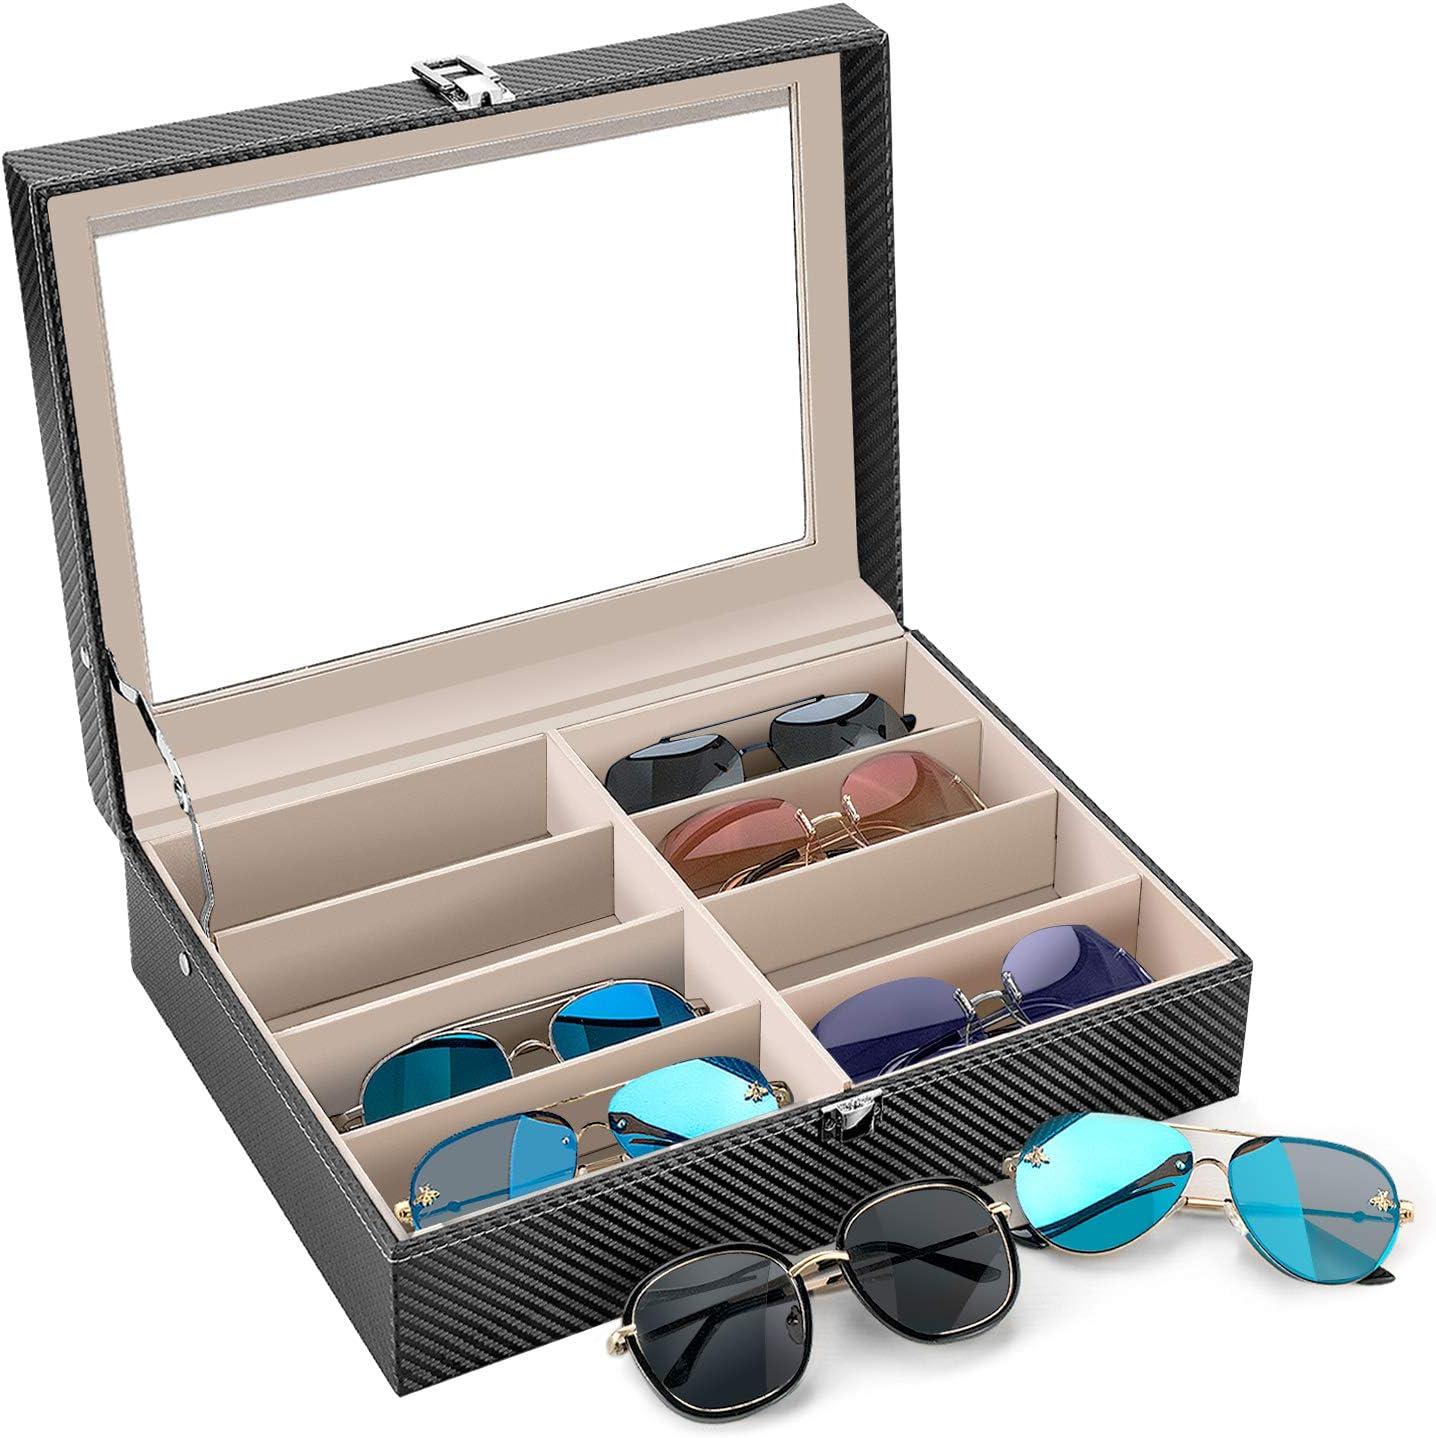 Sunglass Glasses Storage Eyeglasses Collector Eyewear Display Case Storage Box,Sunglasses Jewelry Collection Case bestwishes 8 Slot Carbon Fiber Sunglasses Organizer for Women Men